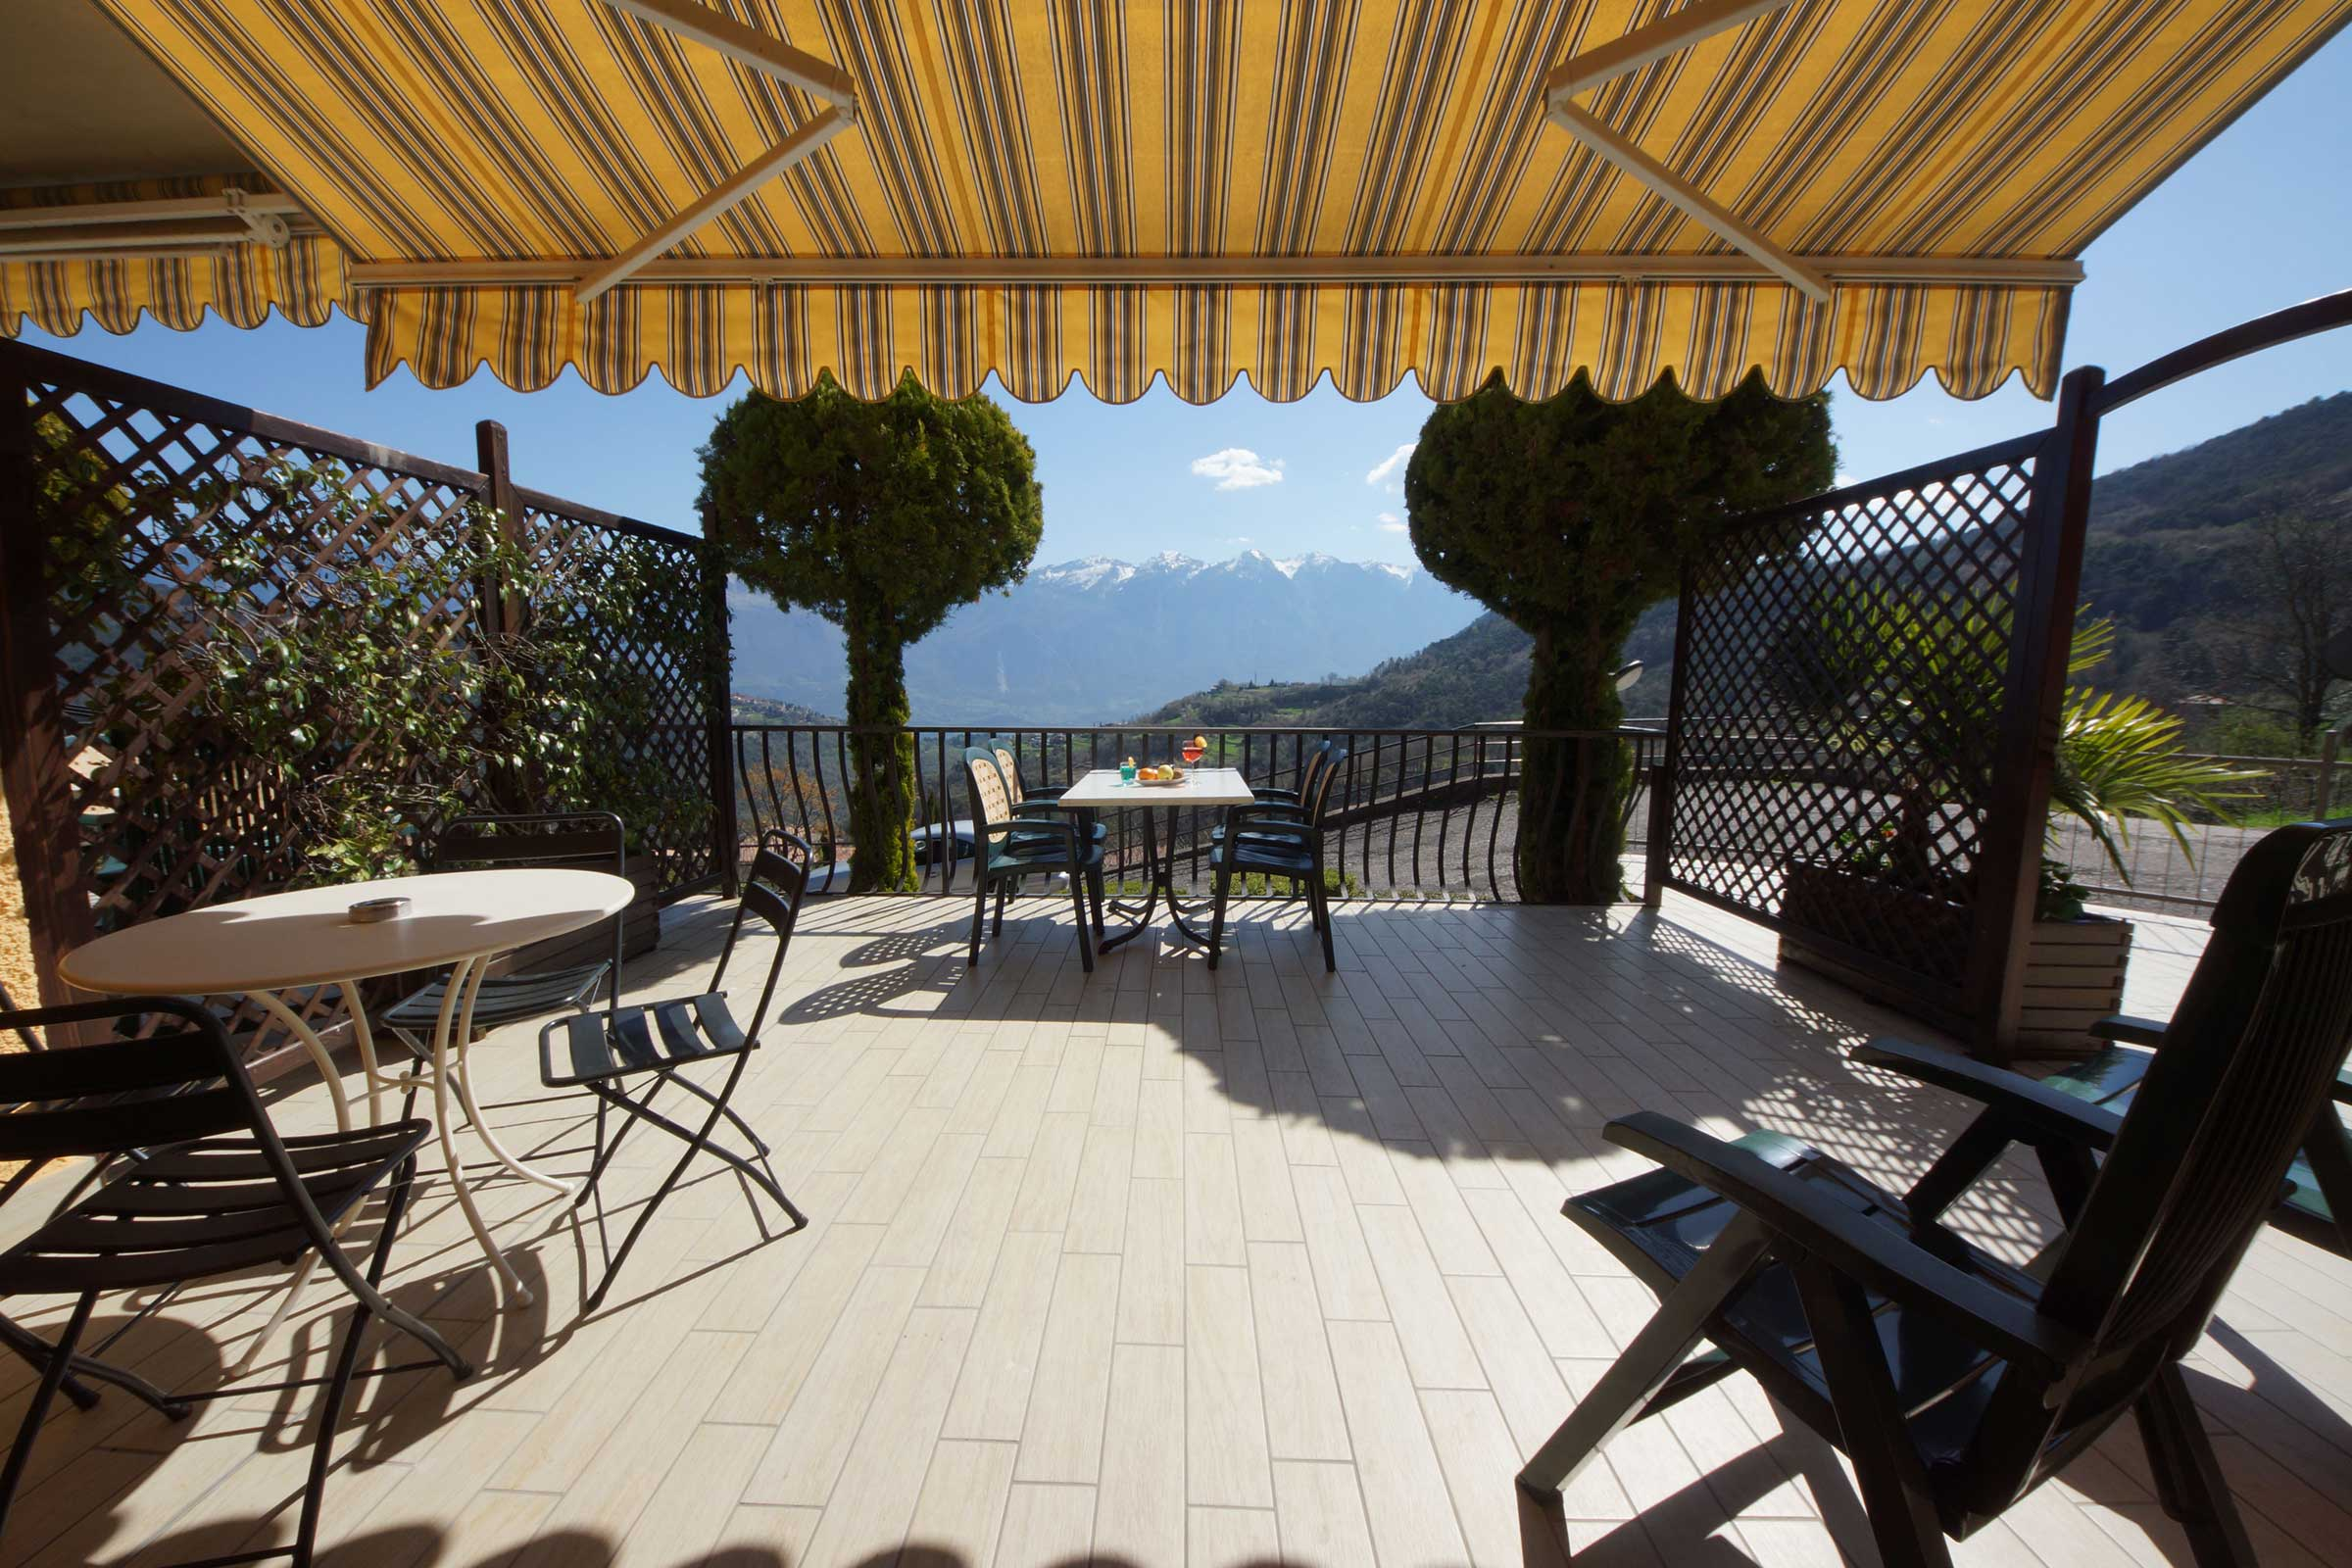 Casa Vacanze Sole 6 Ferienwohnung  Gardasee - Lago di Garda